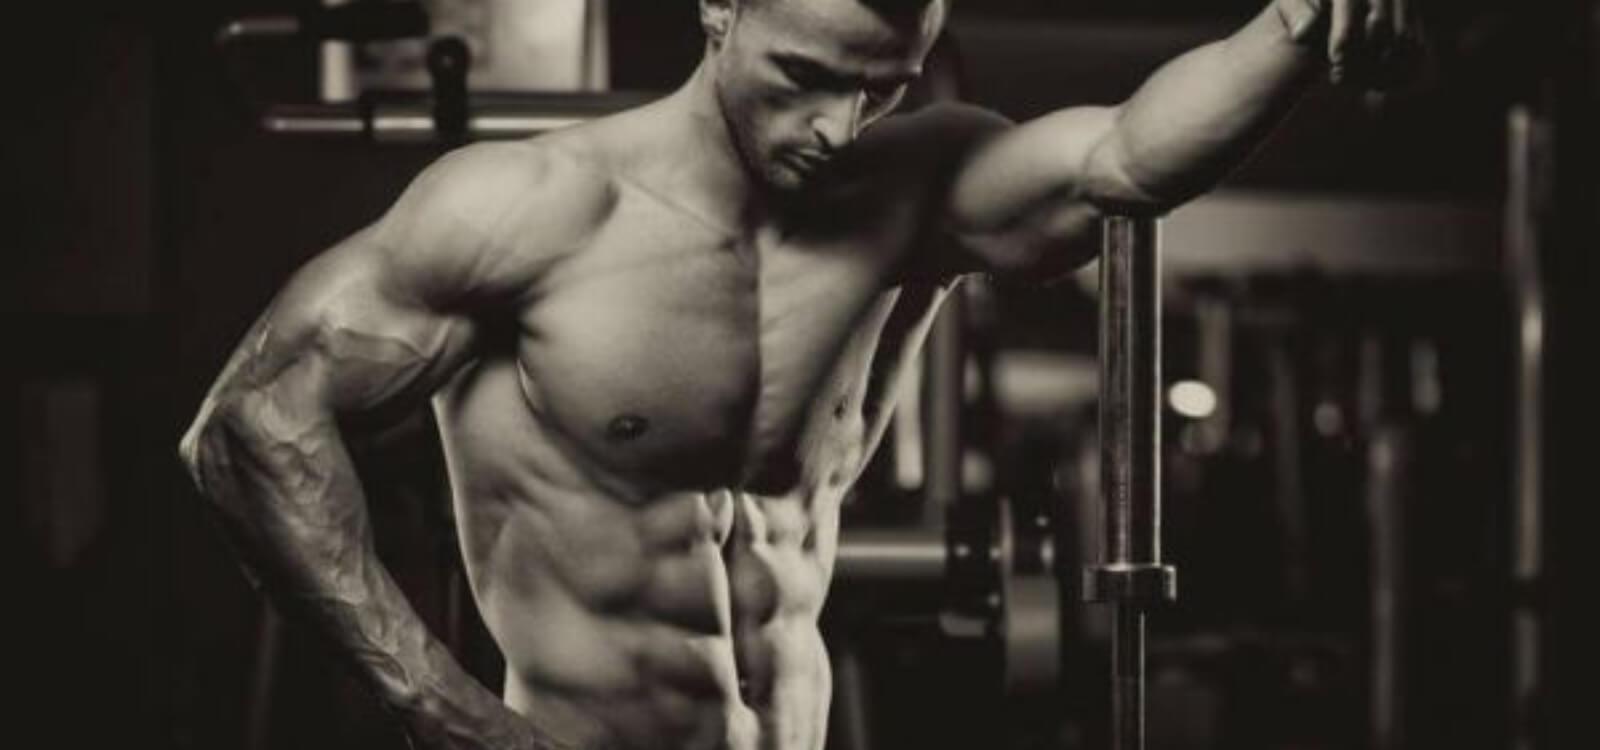 tdee calculator to build muscle